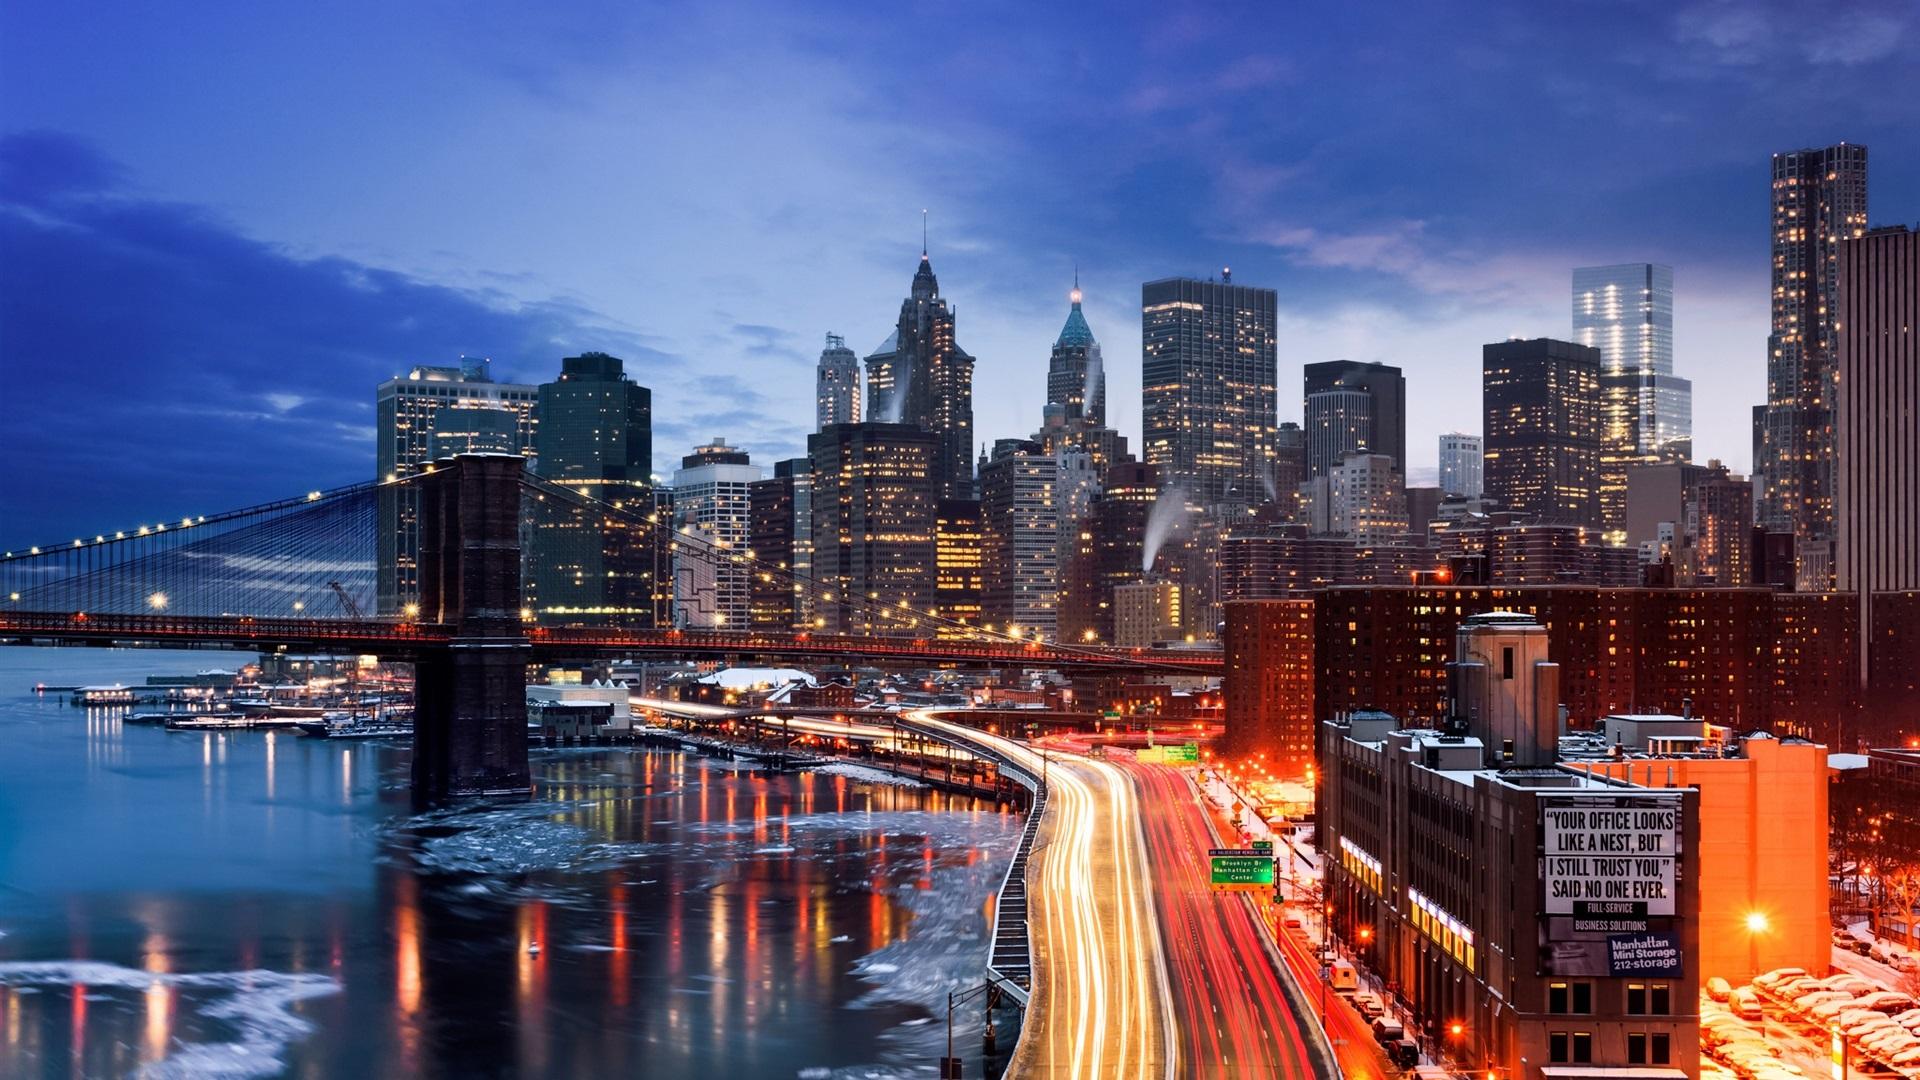 Fonds d 39 cran new york manhattan tats unis l 39 hiver le soir les routes les ponts les - Wallpaper 1080p new york ...